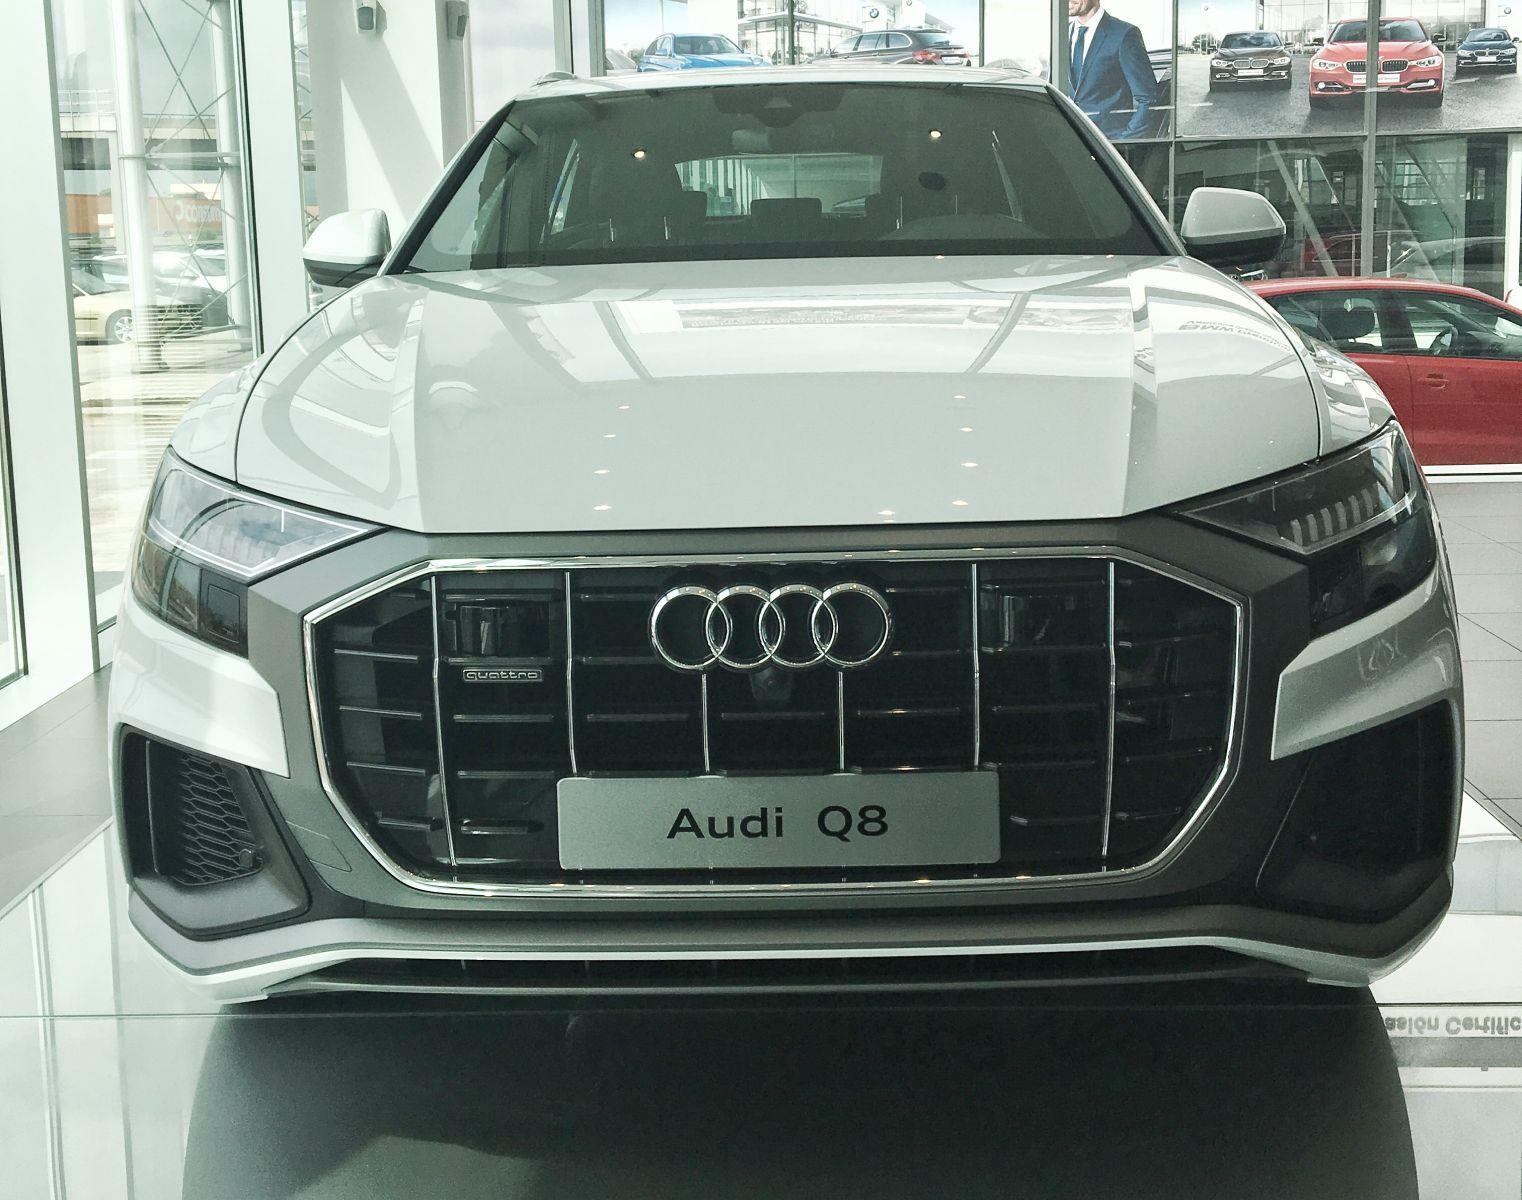 Audi Q8, nacido para impresionar